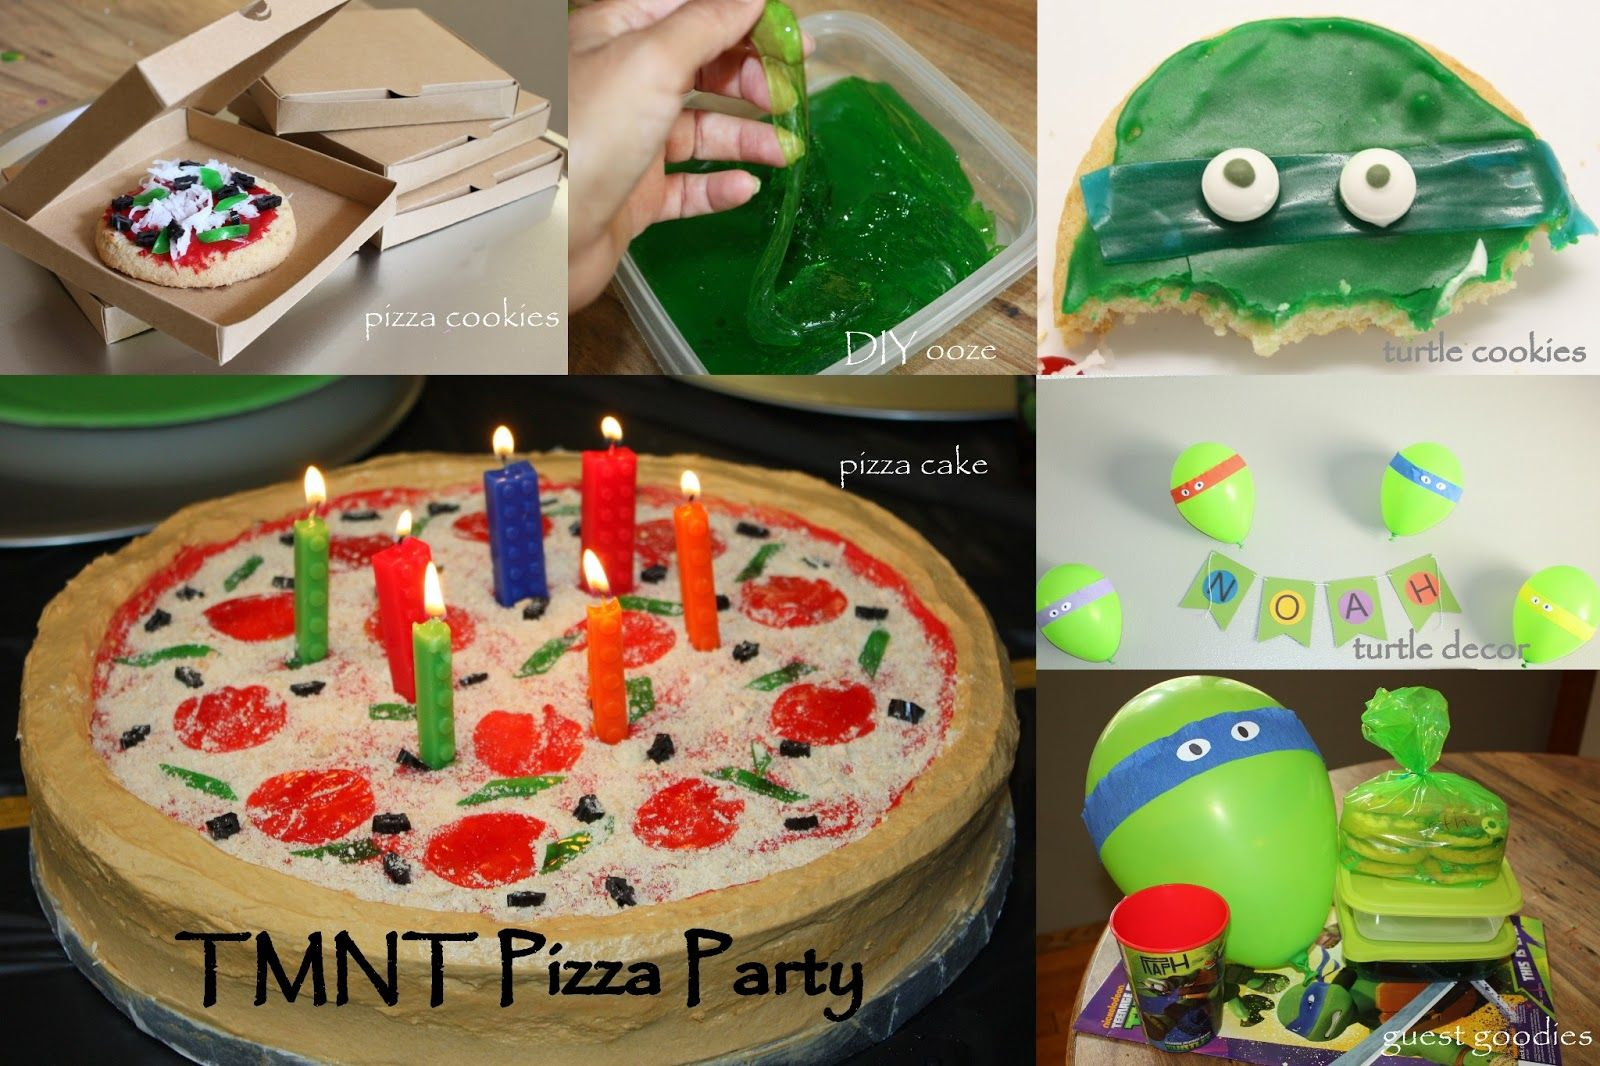 teenage mutant ninja turtles party supplies walmart pizza cake